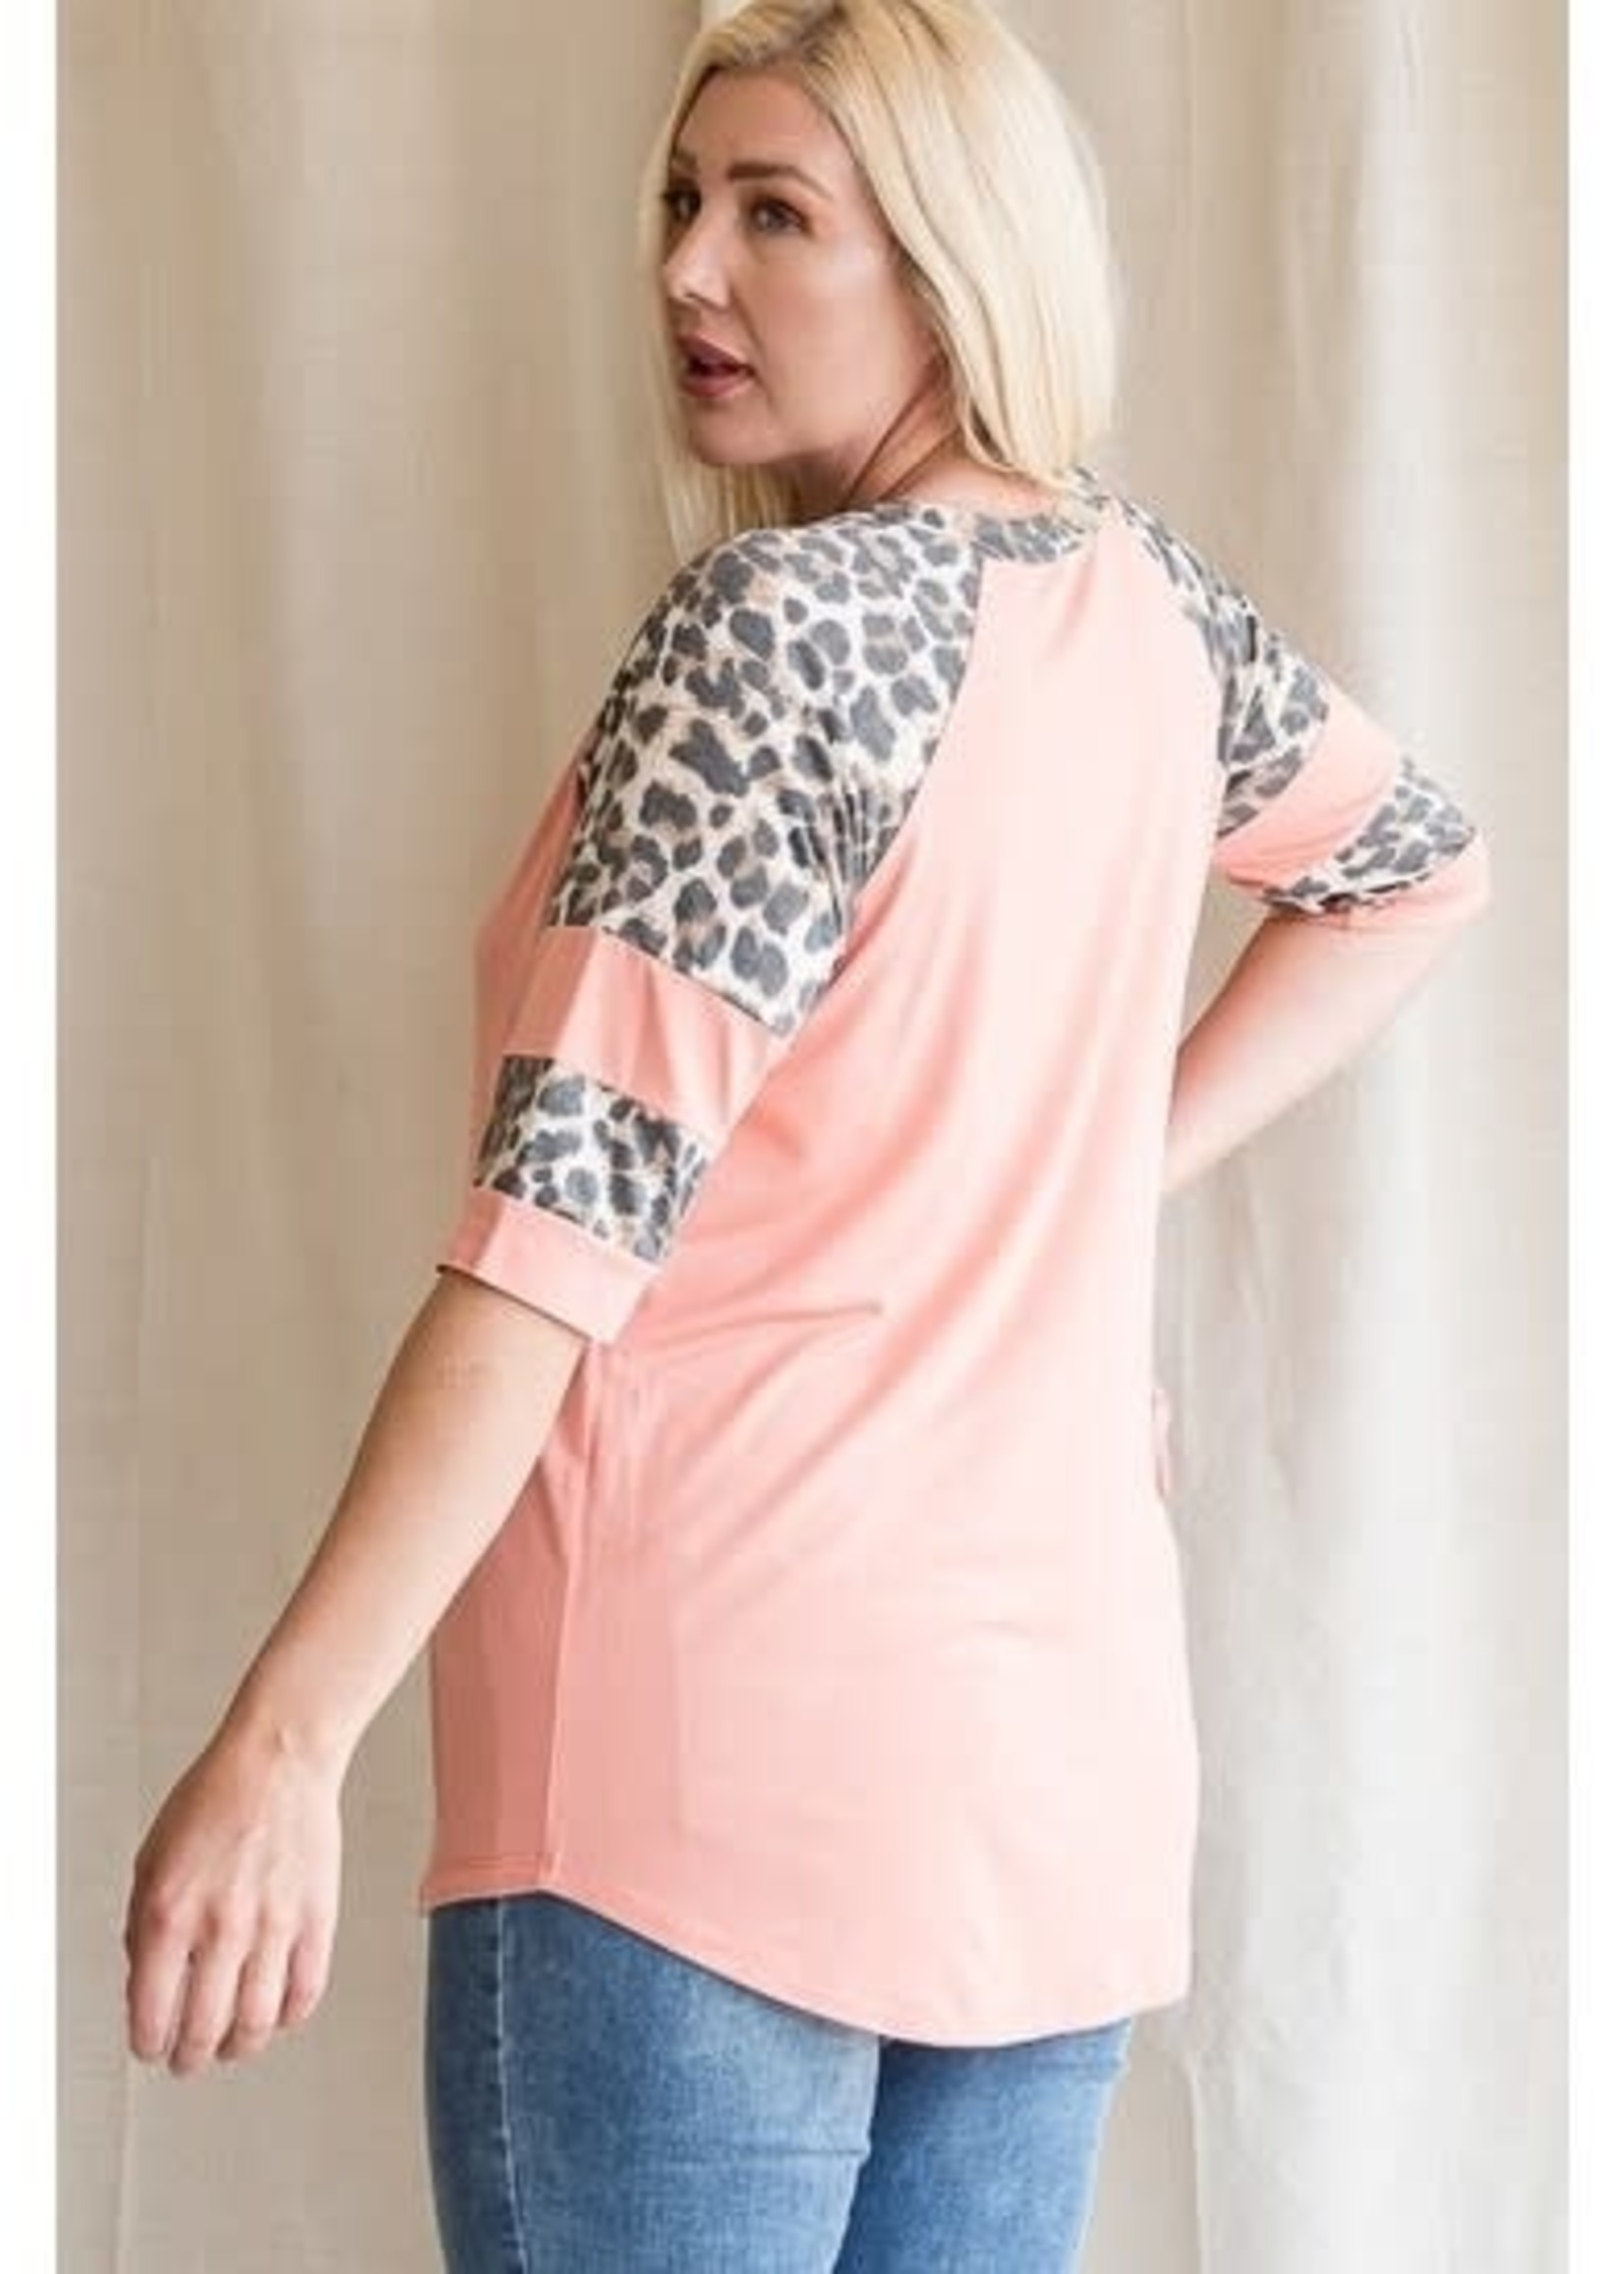 7th Ray Blushing Cheetah